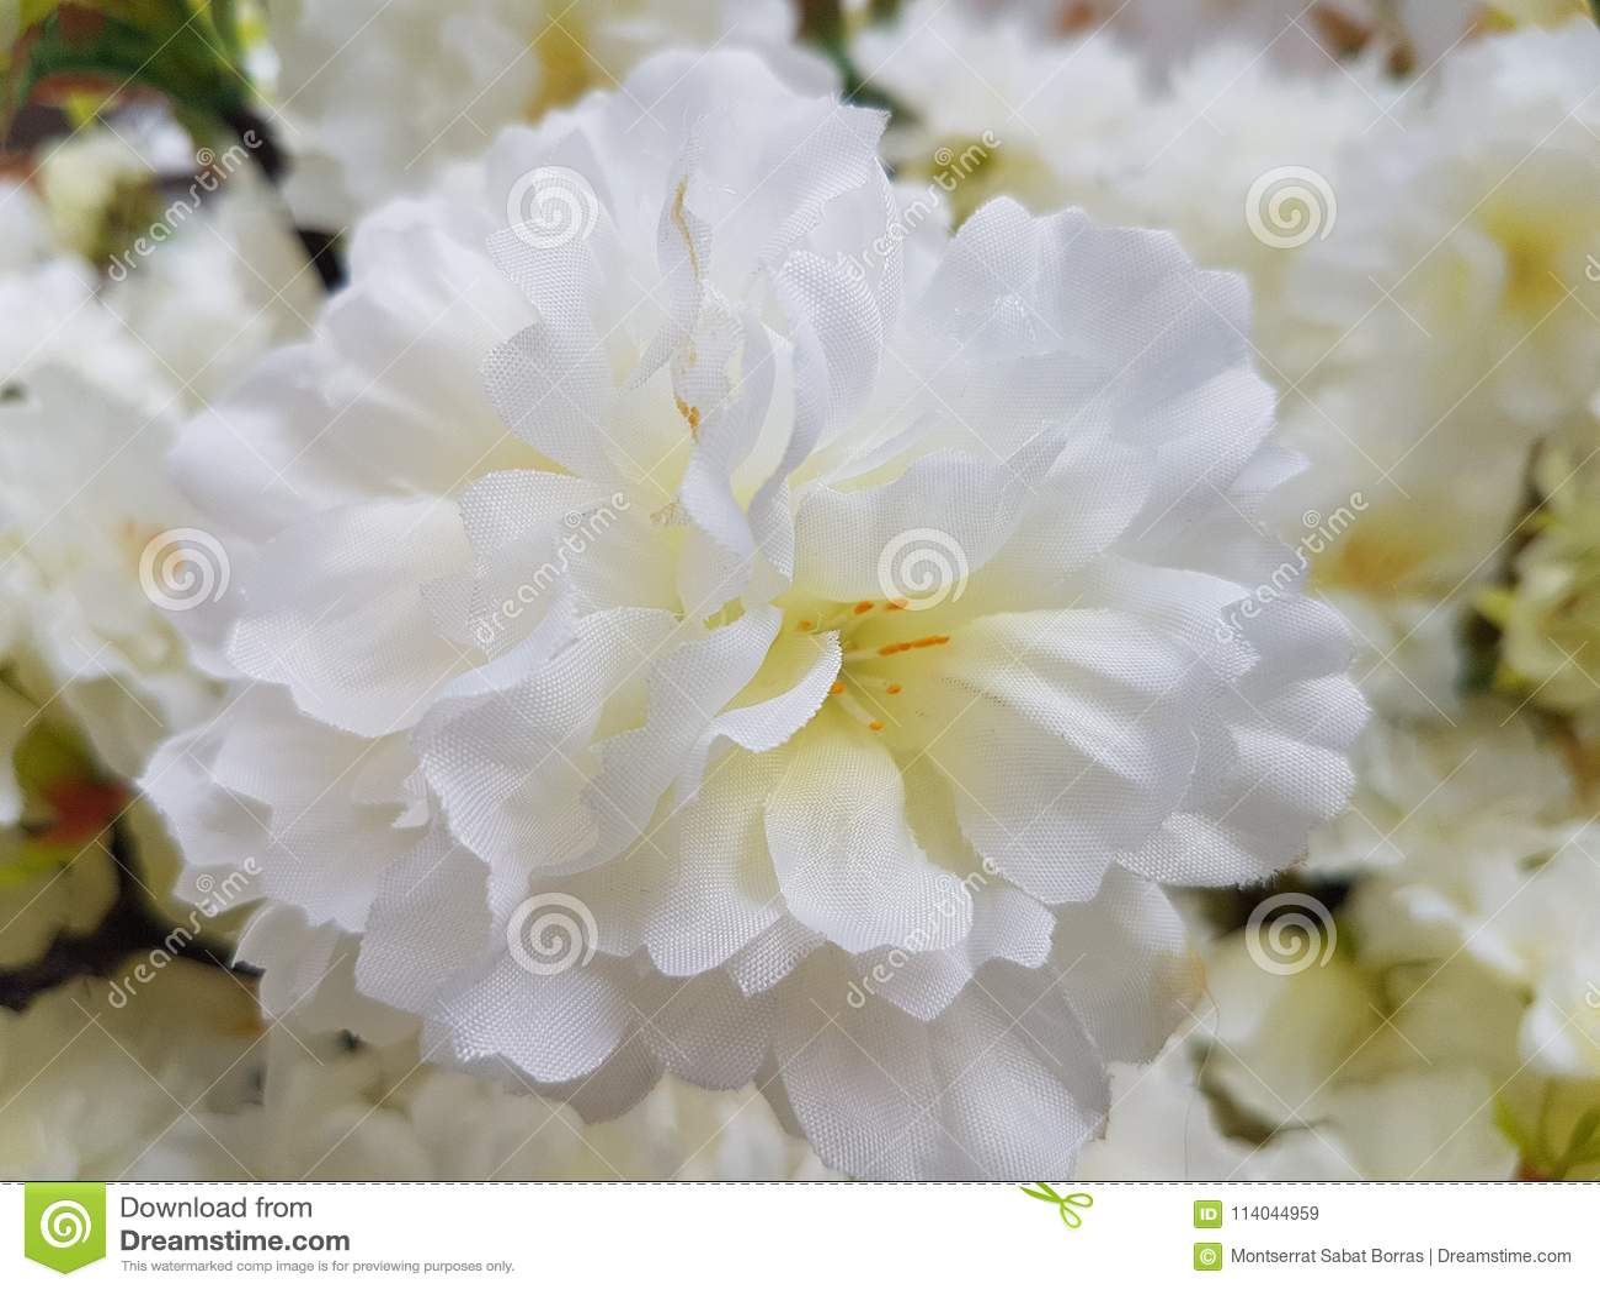 White plastic poppy flowers stock image image of corsage large white plastic poppy flowers mightylinksfo